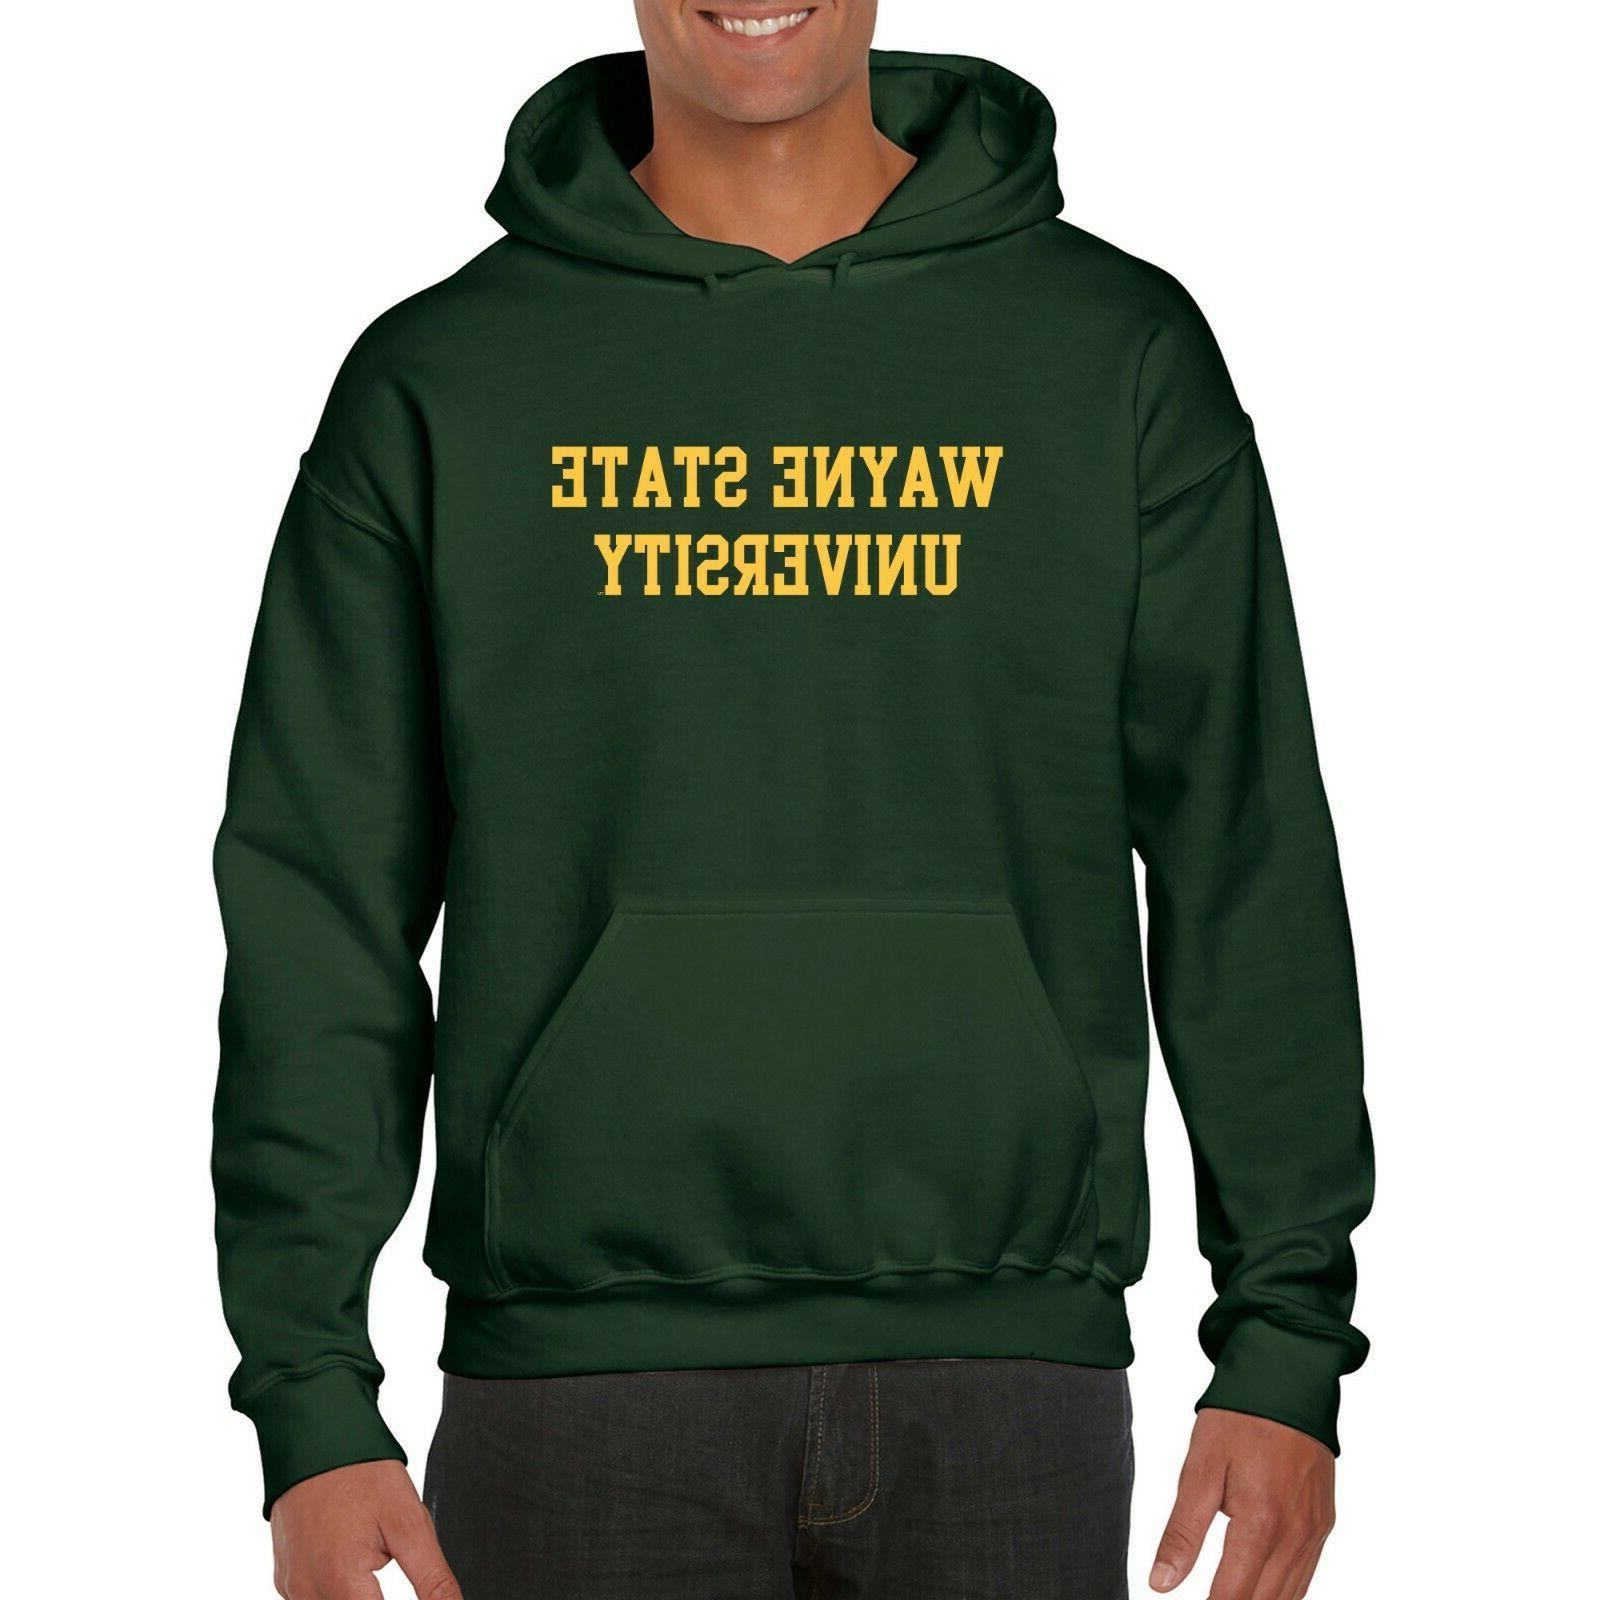 Wayne State Basic Block Hooded Sweatshirt